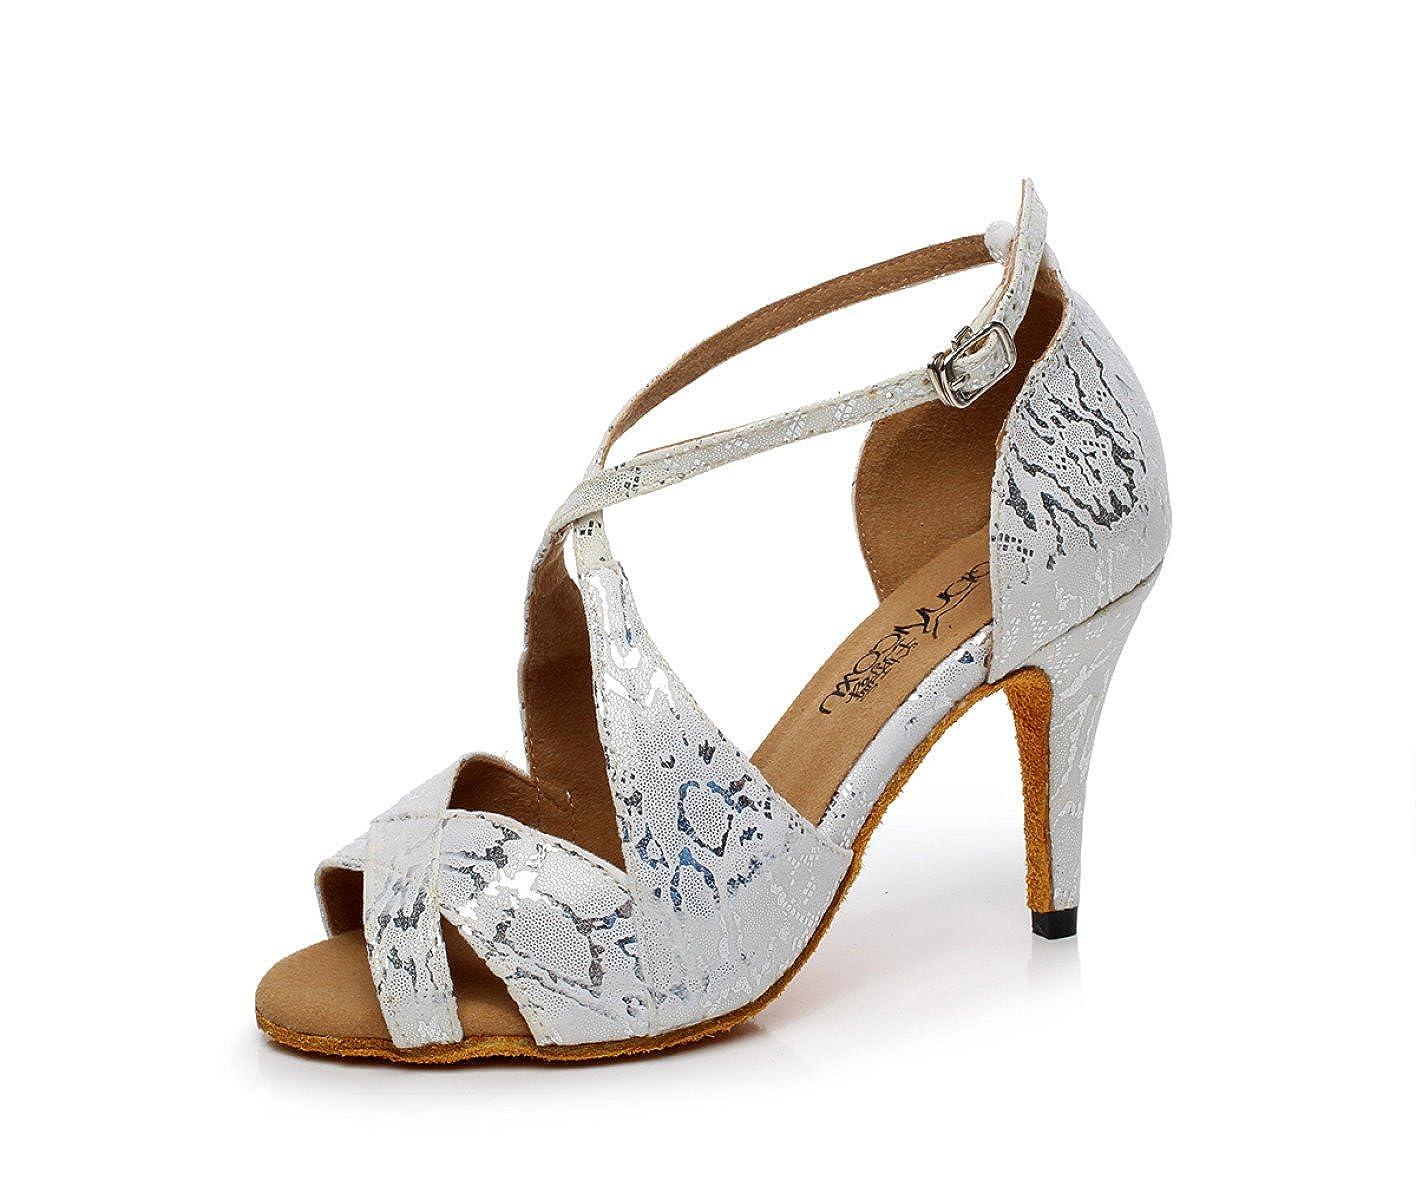 JSHOE Chaussures De 19918 Danse B078WJRKQL Latine pour Femme Salsa Chaussures/Tango/ Thé/Samba/ Moderne/Jazz Chaussures Sandales Talons Hauts,Grey-heeled8.5cm-UK7/EU41/Our42 - e2d59be - automaticcouplings.space